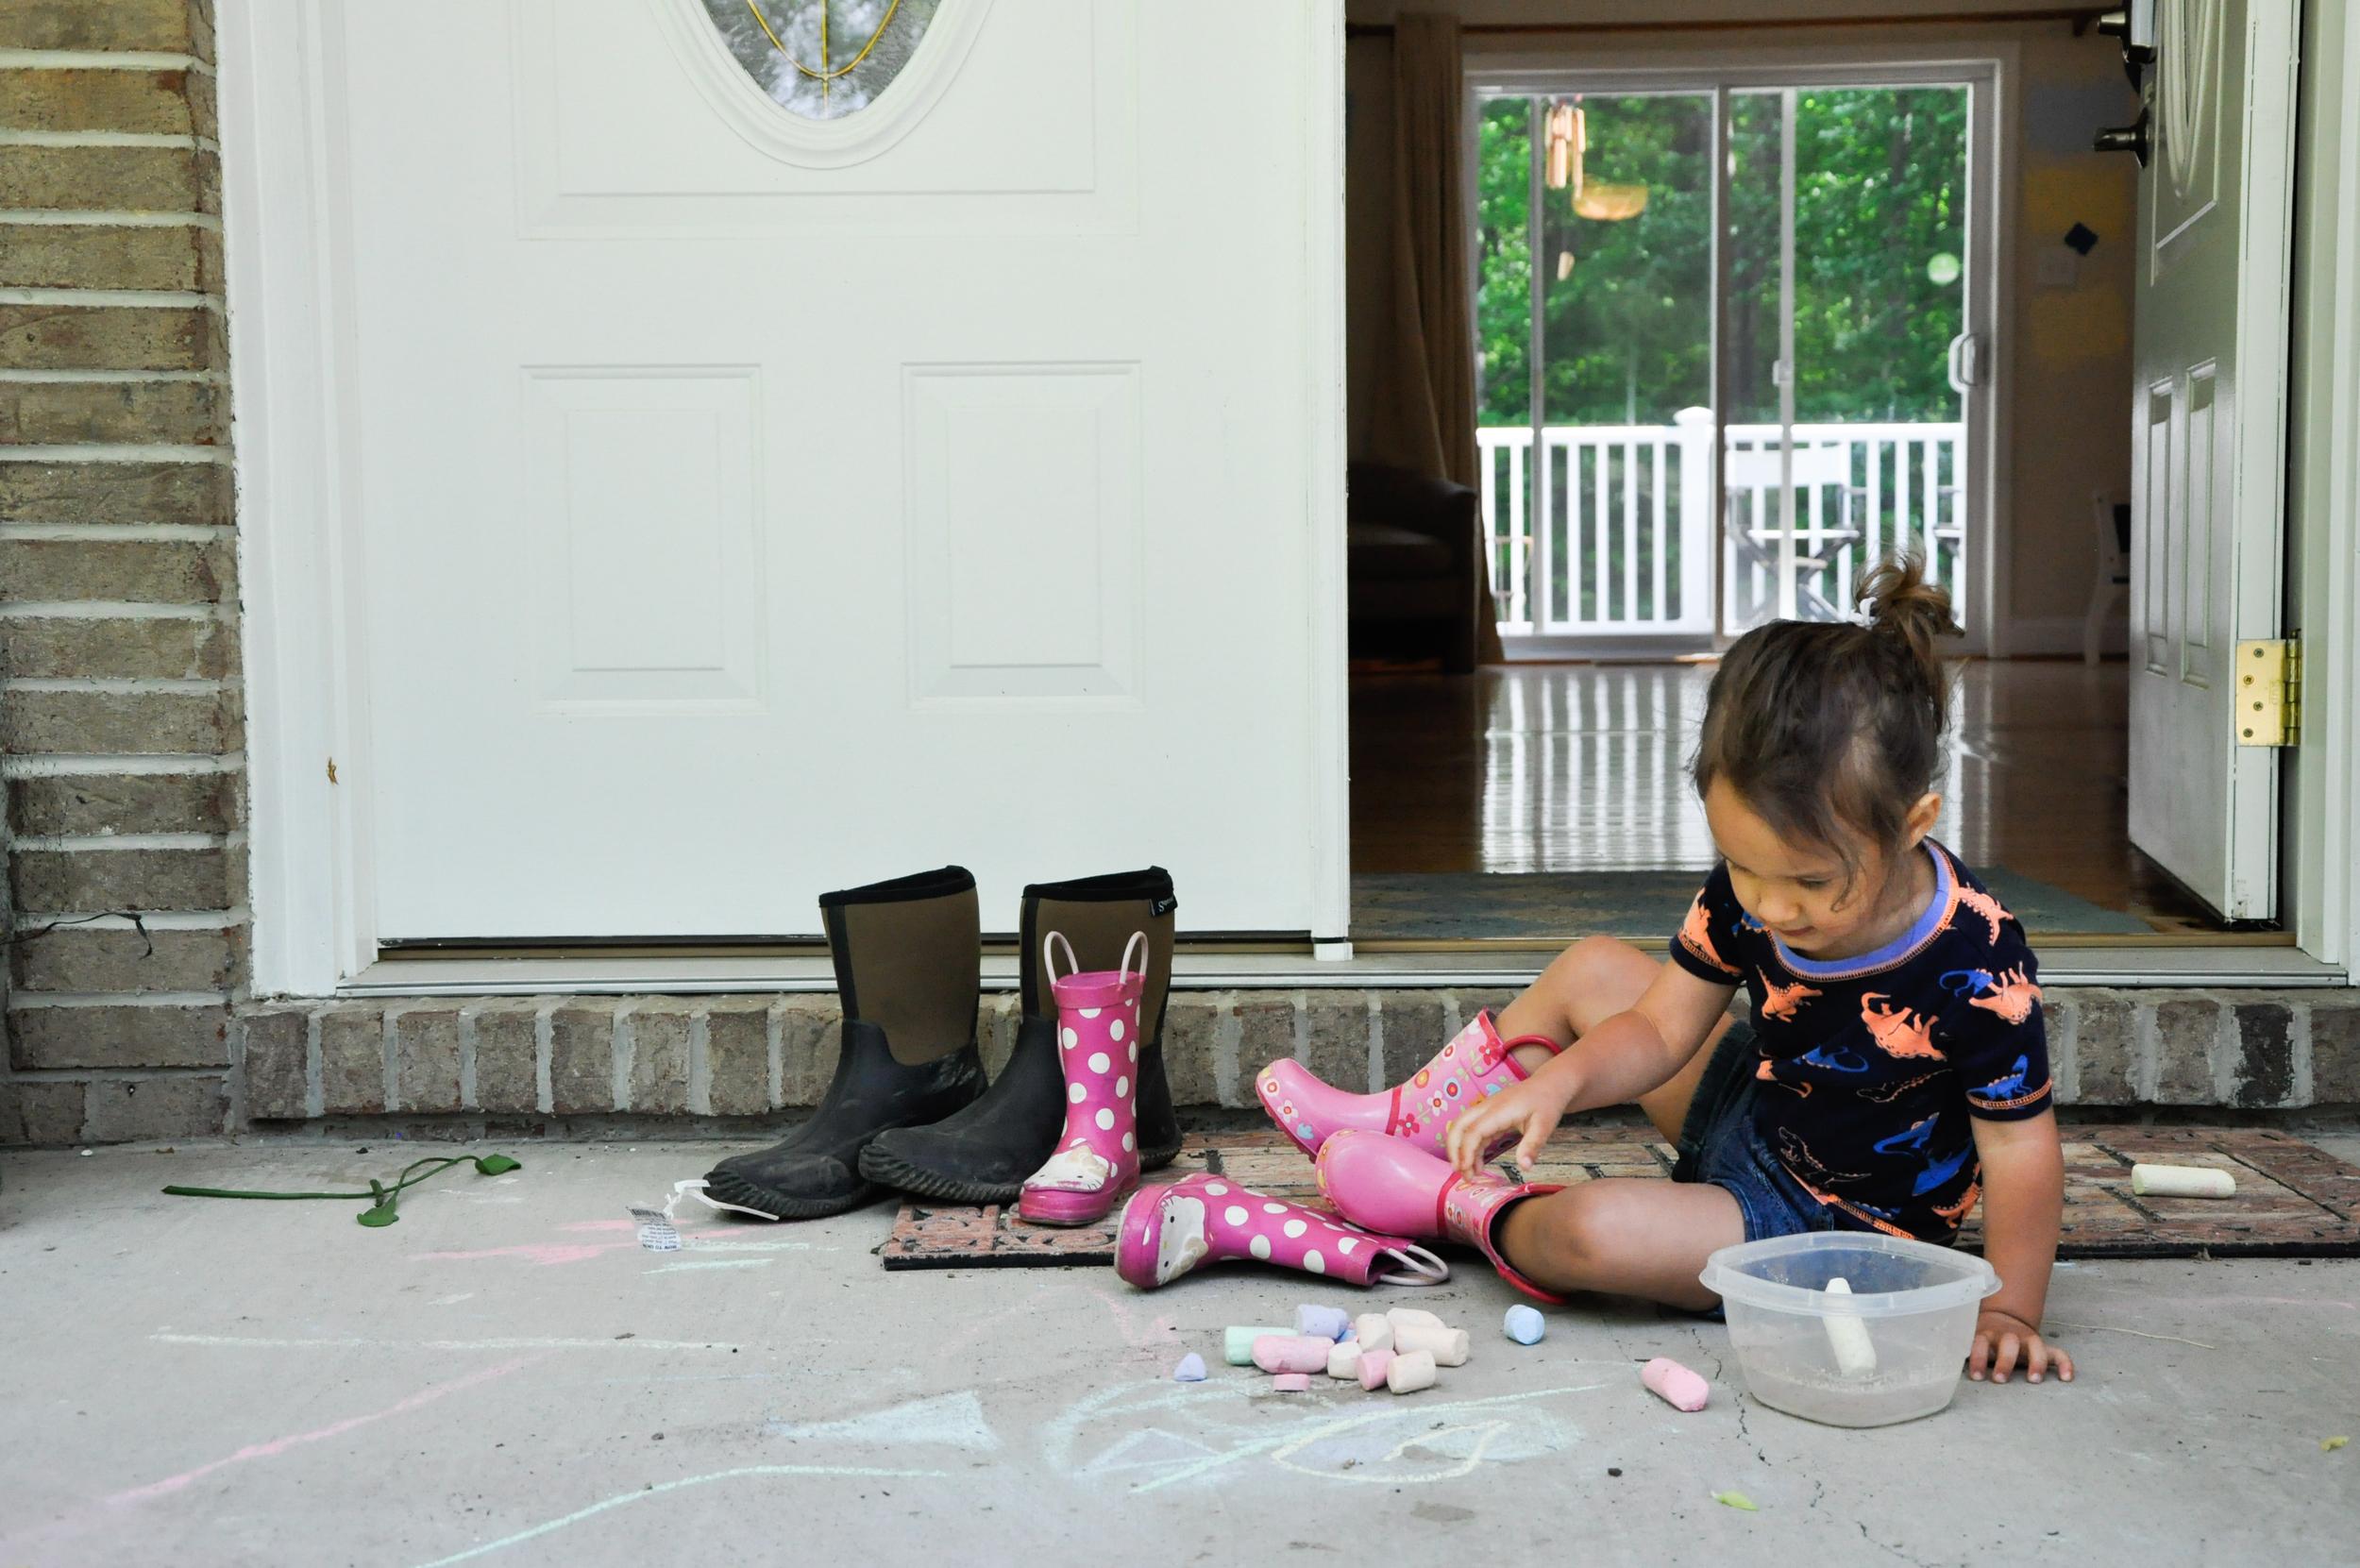 hazel and the chalk.jpg